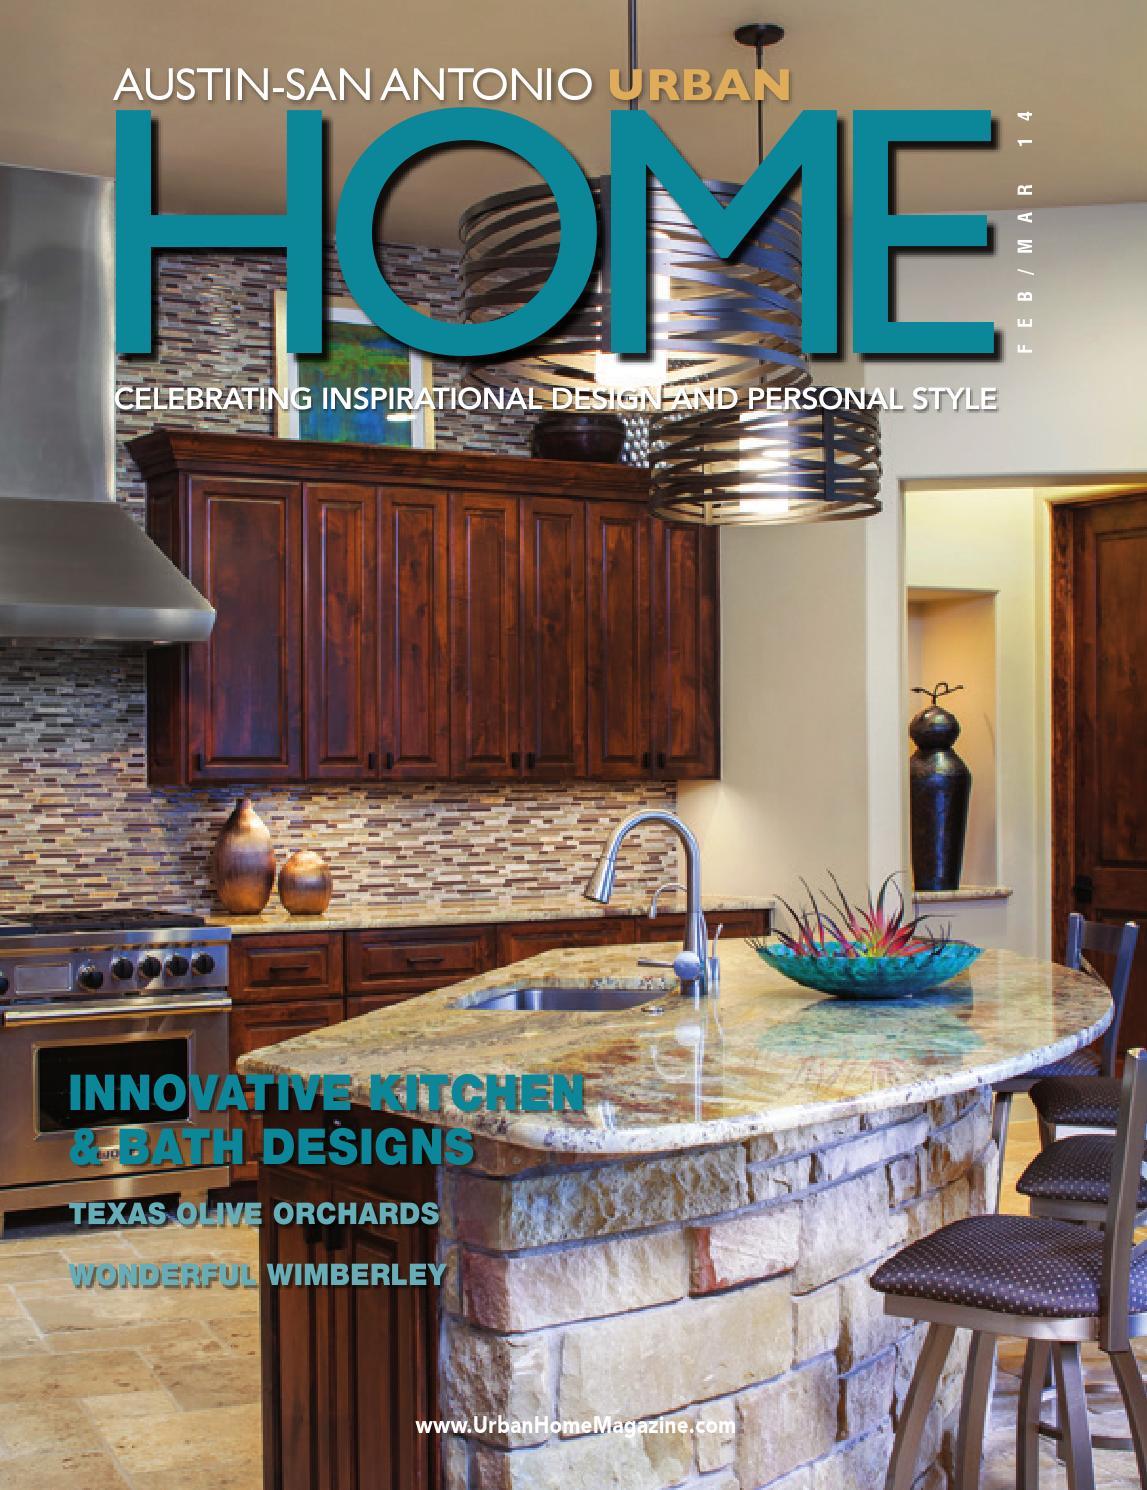 Euro Design Kitchen And Bath San Antonio